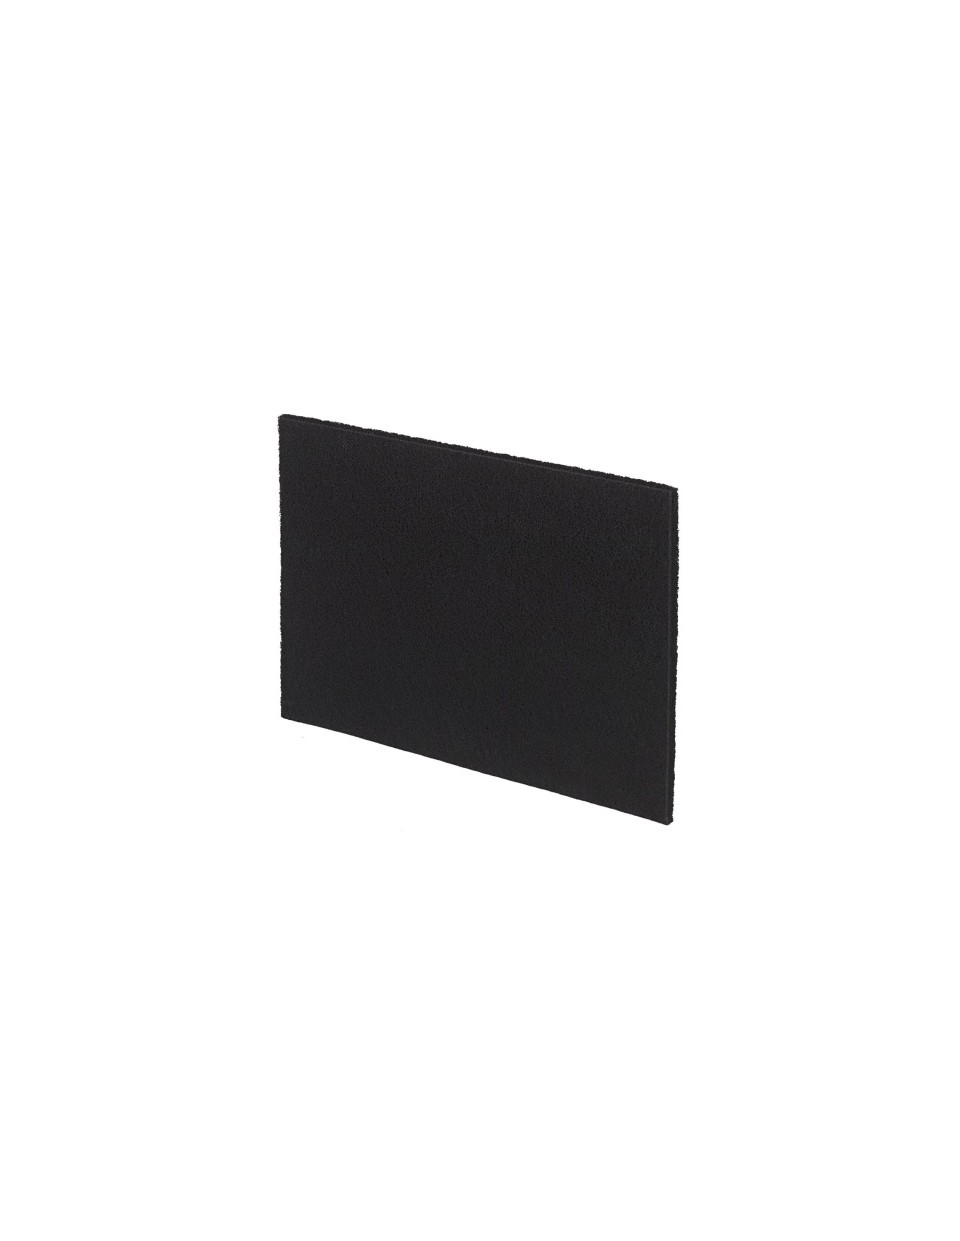 Filter carbon za PT65 - 2PK